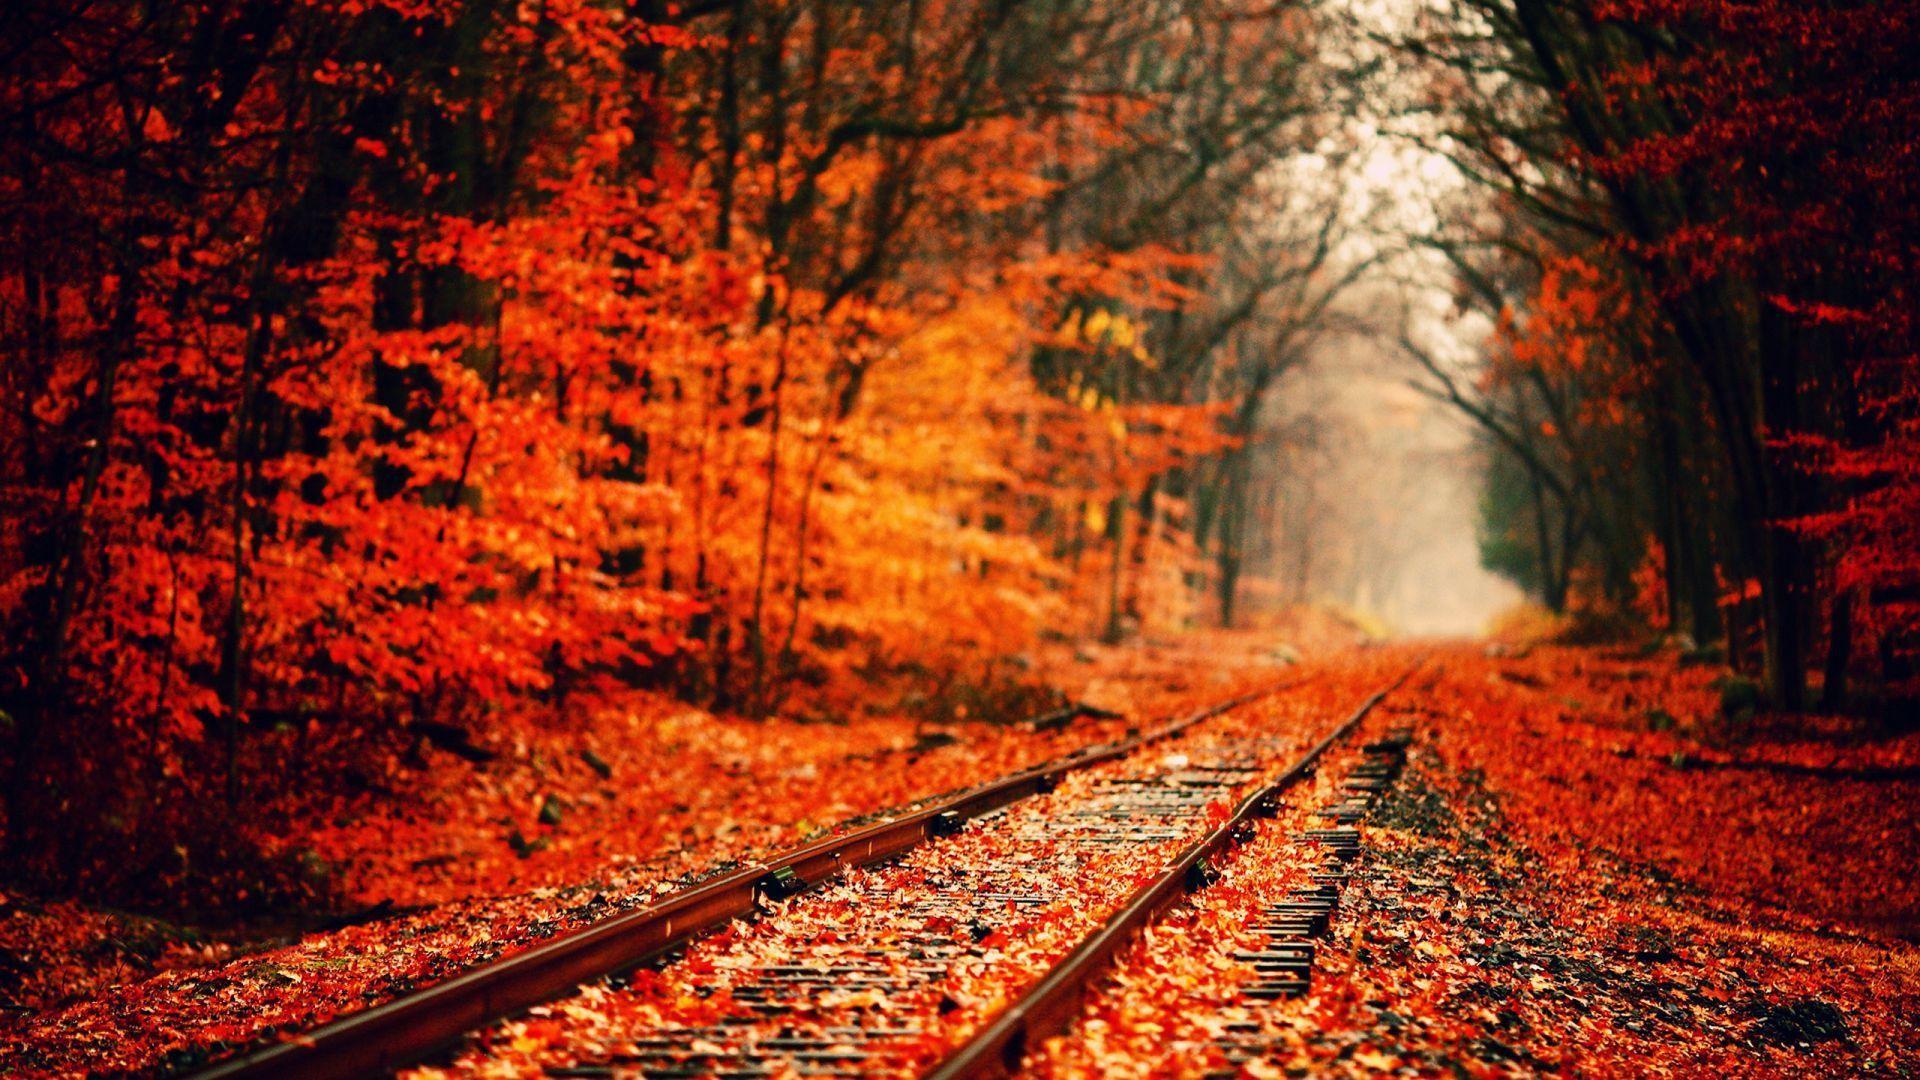 Autumn-Tumblr-Background-ypz-1920×1080-px-KB-Nature-